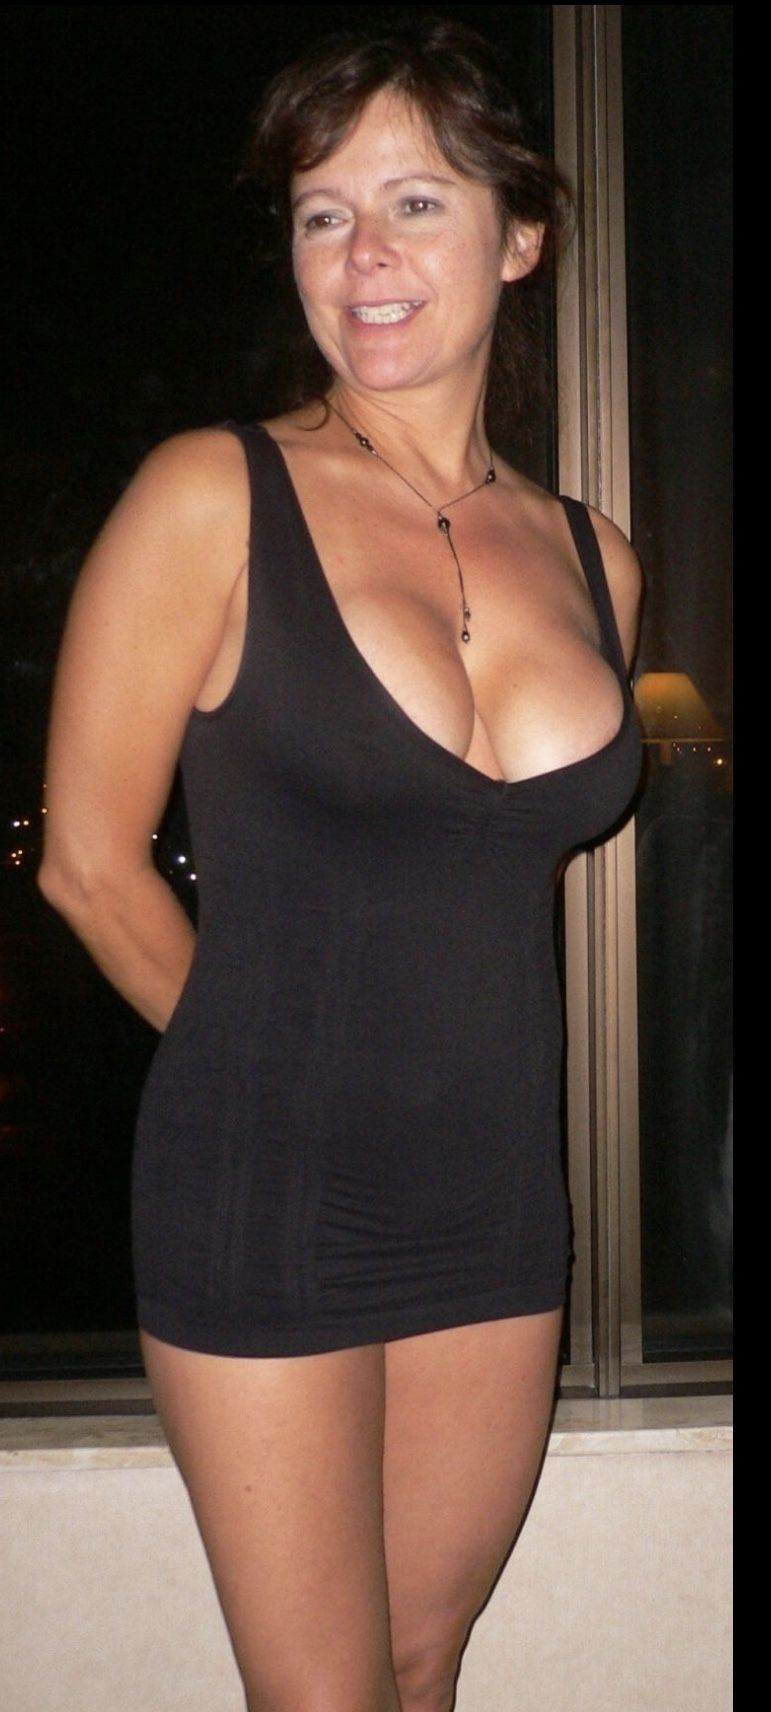 Women pics older sexy Women As